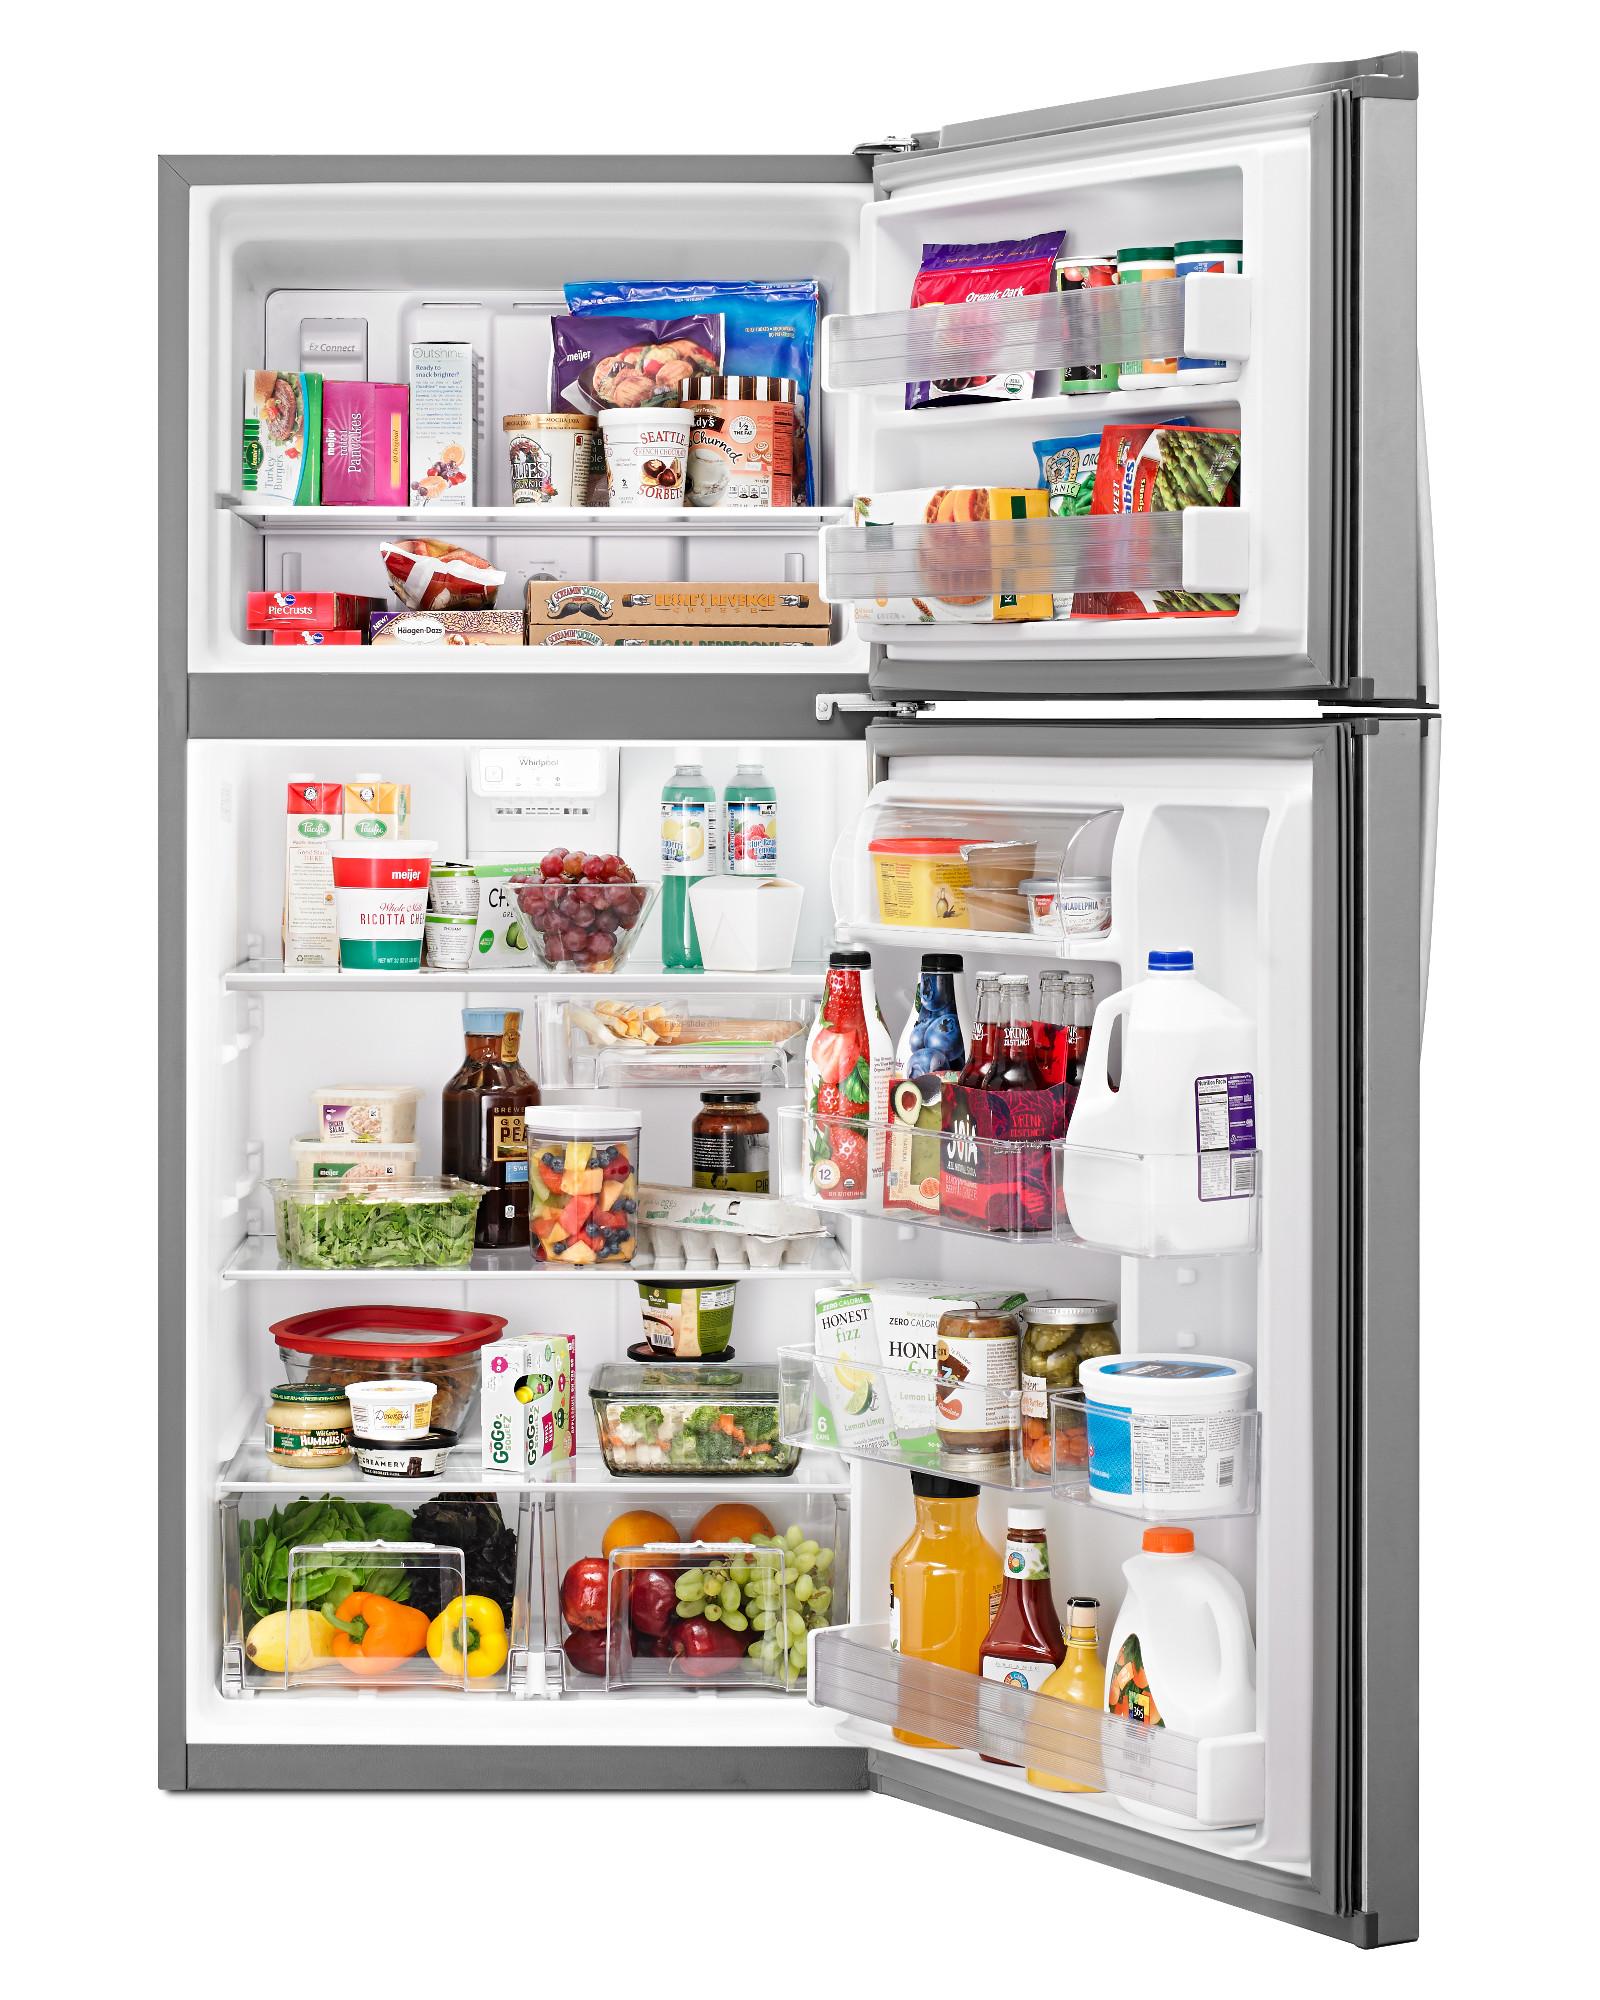 Whirlpool WRT549SZDM 19 cu. ft. Top Freezer Refrigerator - Stainless Steel